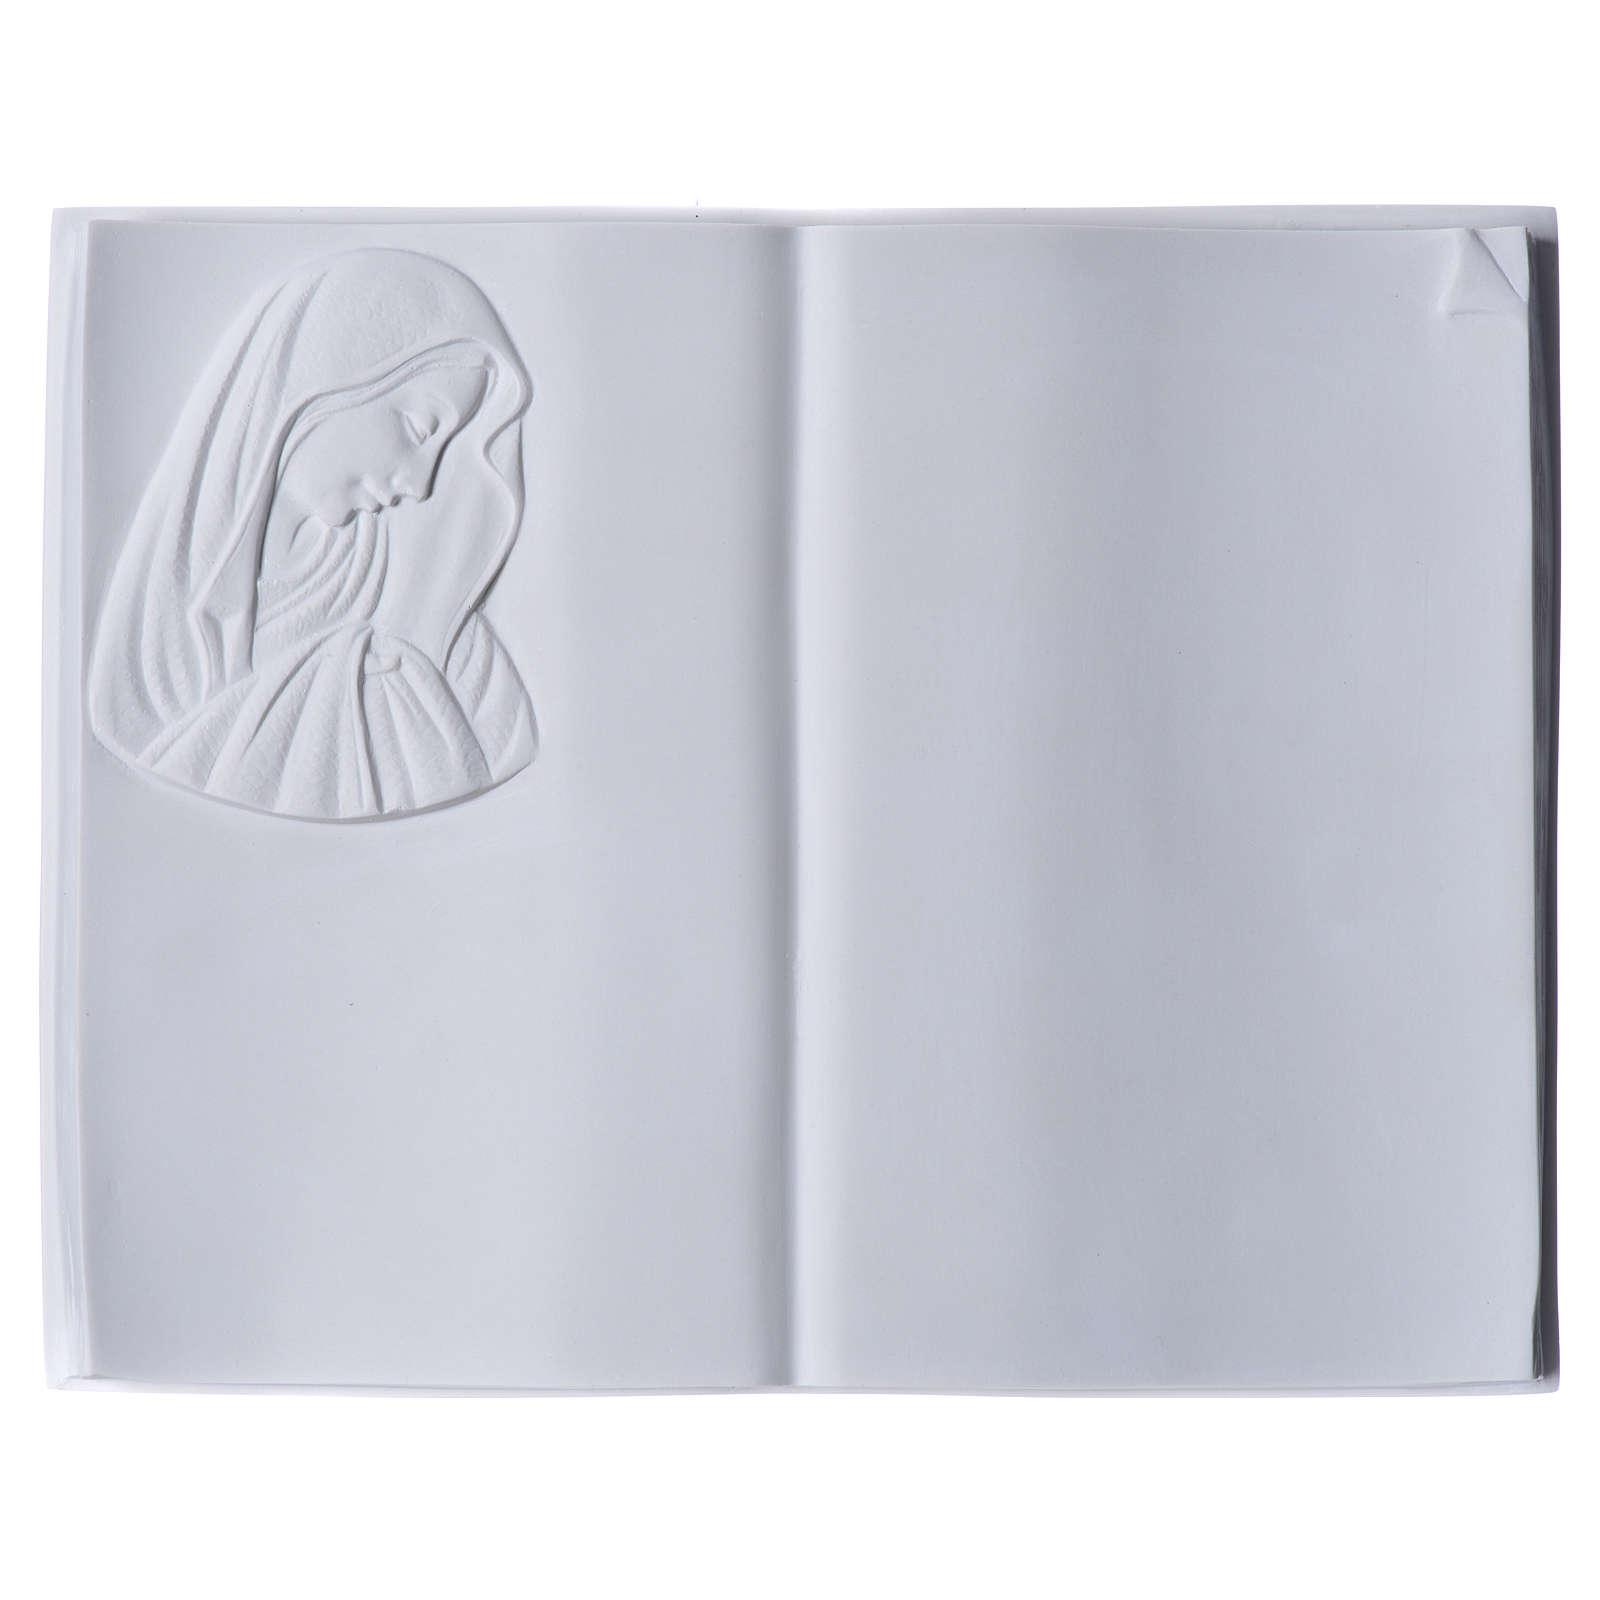 Libro targa per cimiteri marmo sintetico Madonna 3